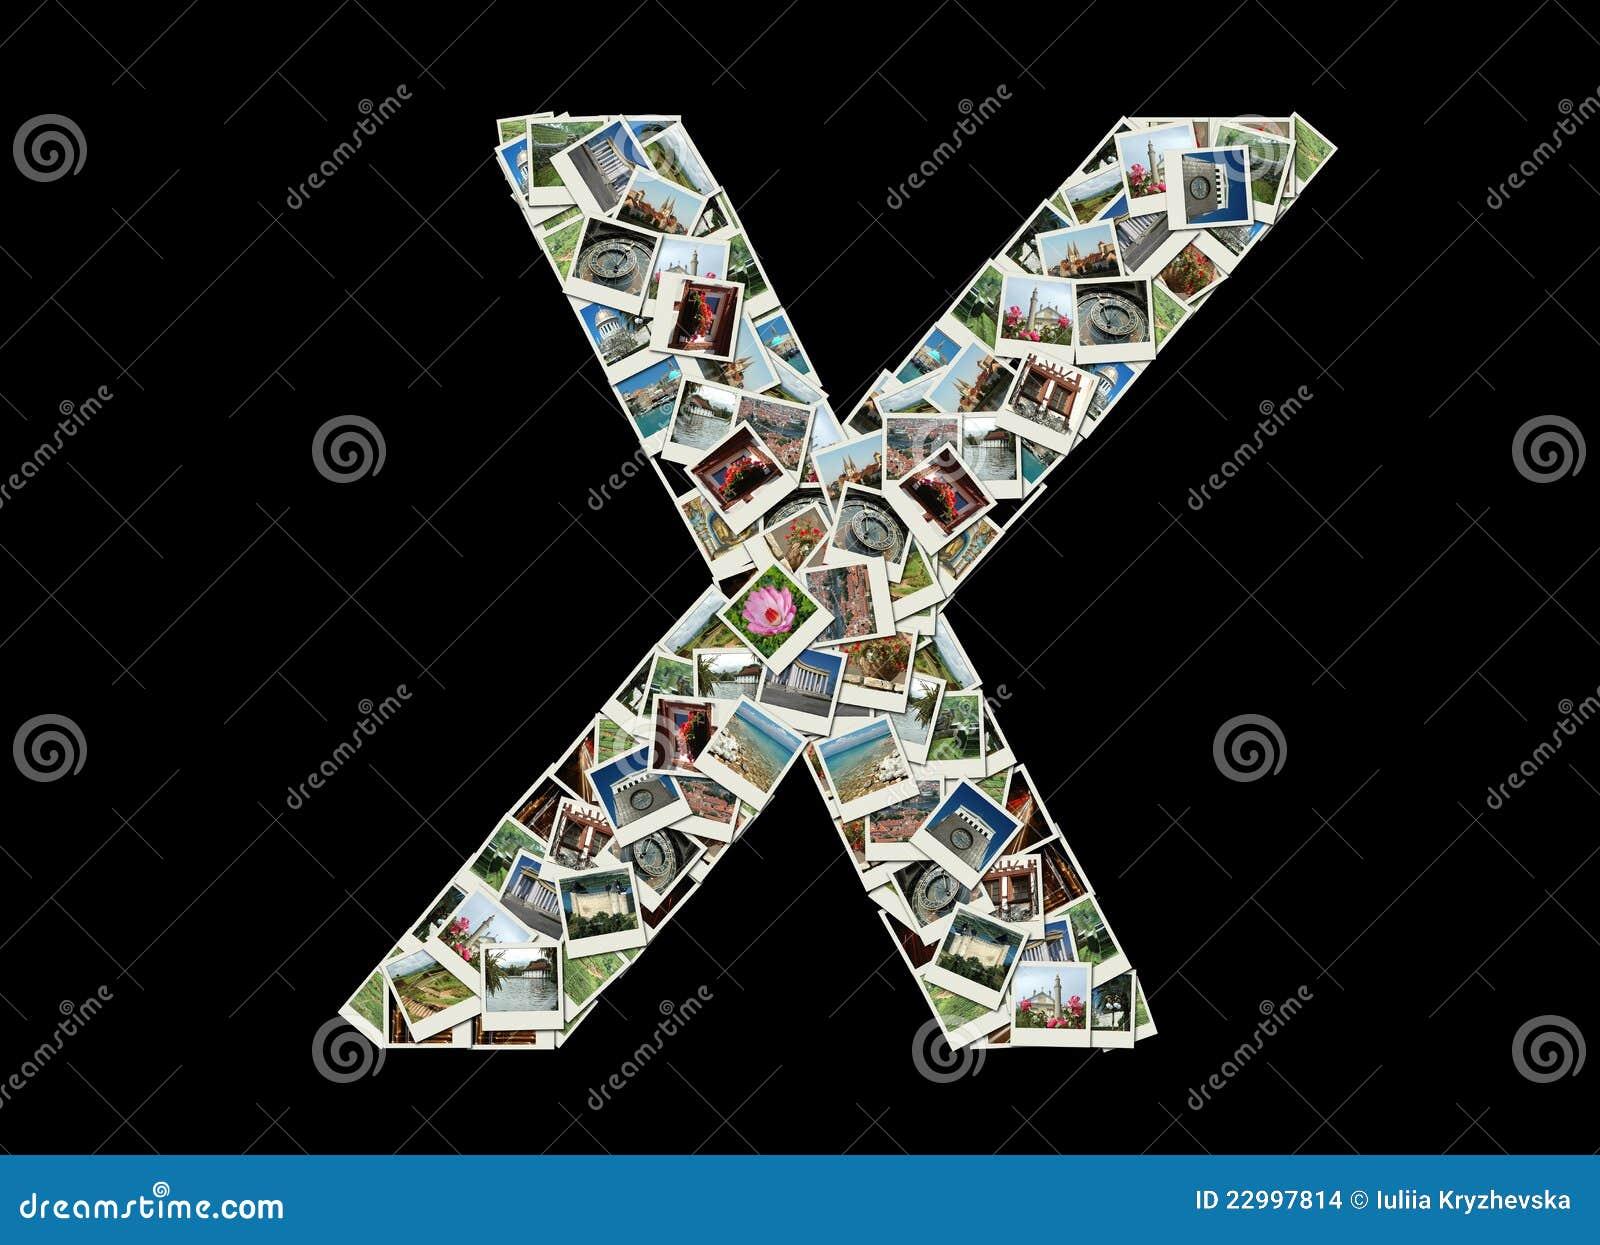 X письмо - коллаж фото перемещения